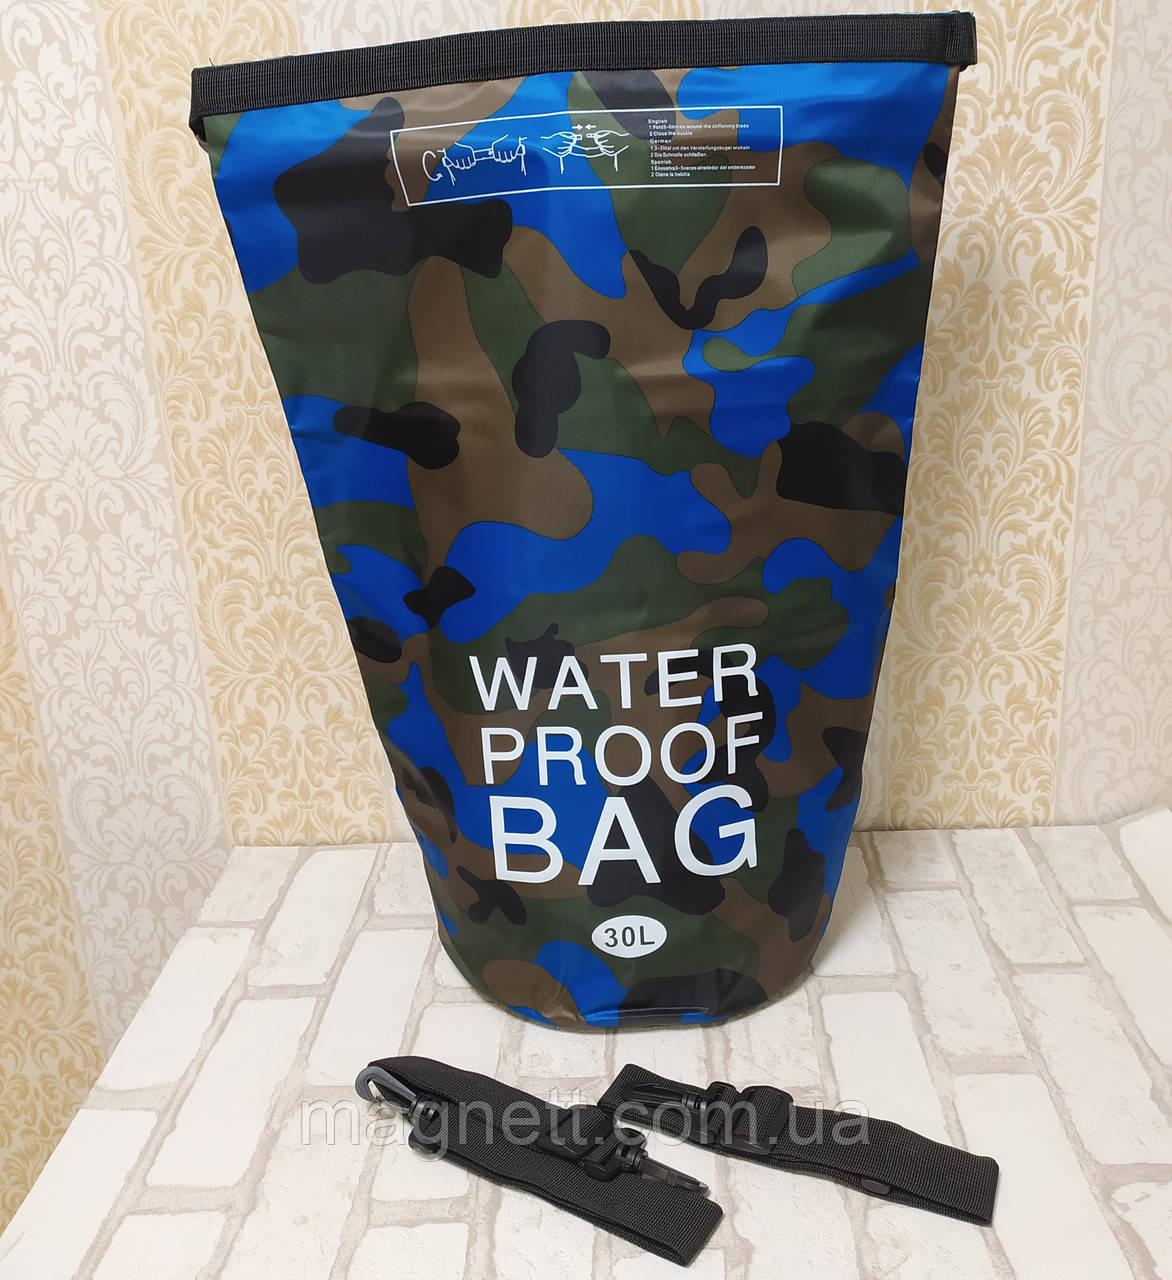 Водонепроницаемая сумка с плечевым ремнем Water proof Bag 30л